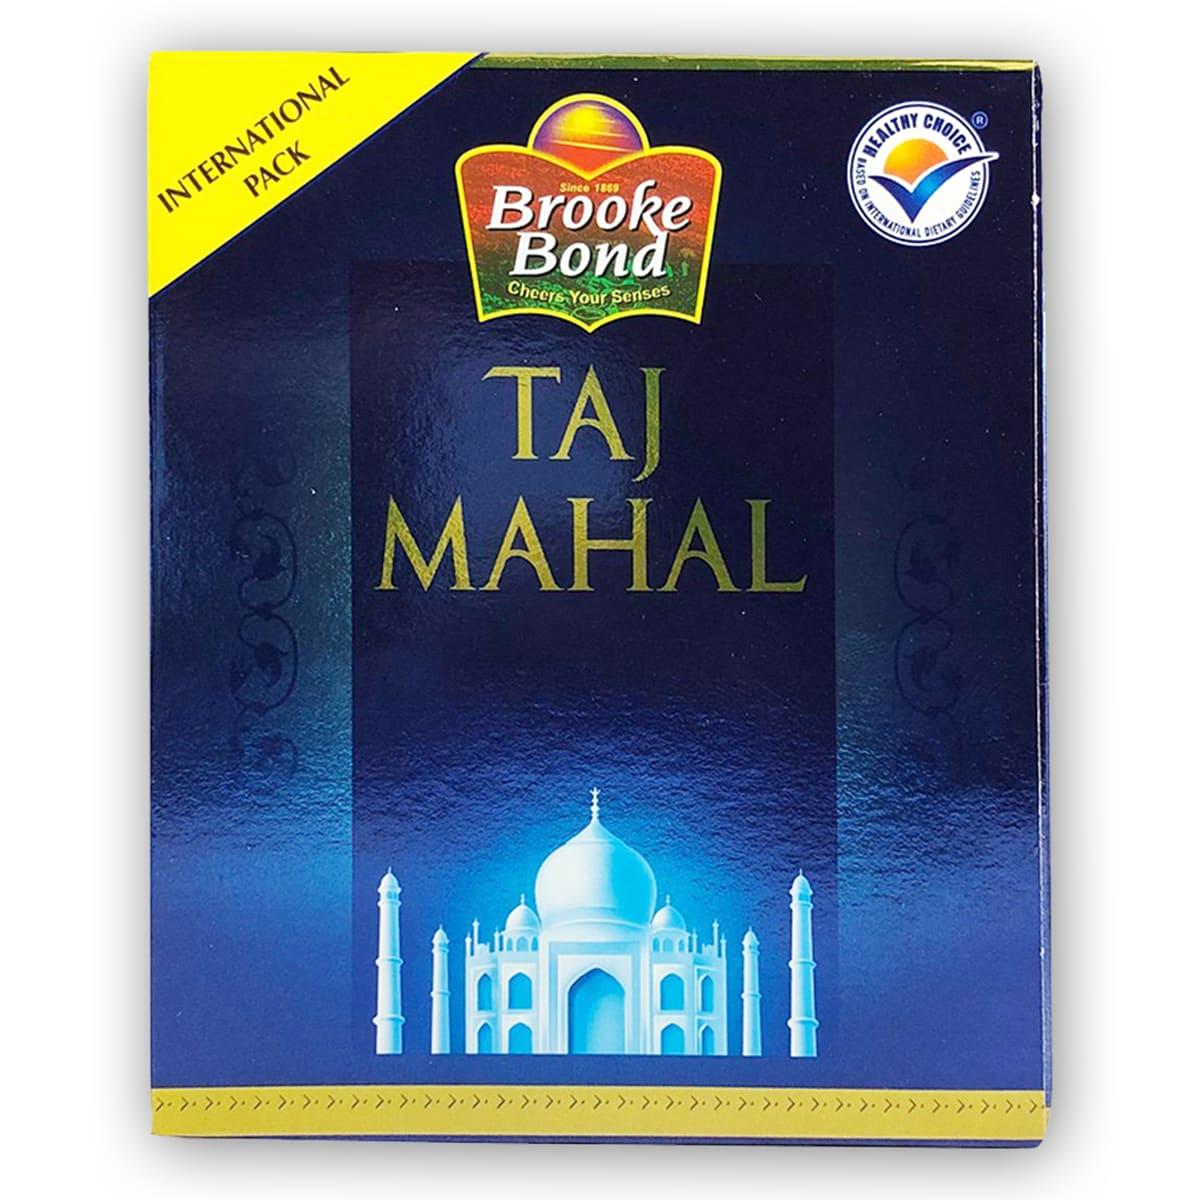 Buy Brooke Bond Taj Mahal Tea (Loose Tea) - 450 gm